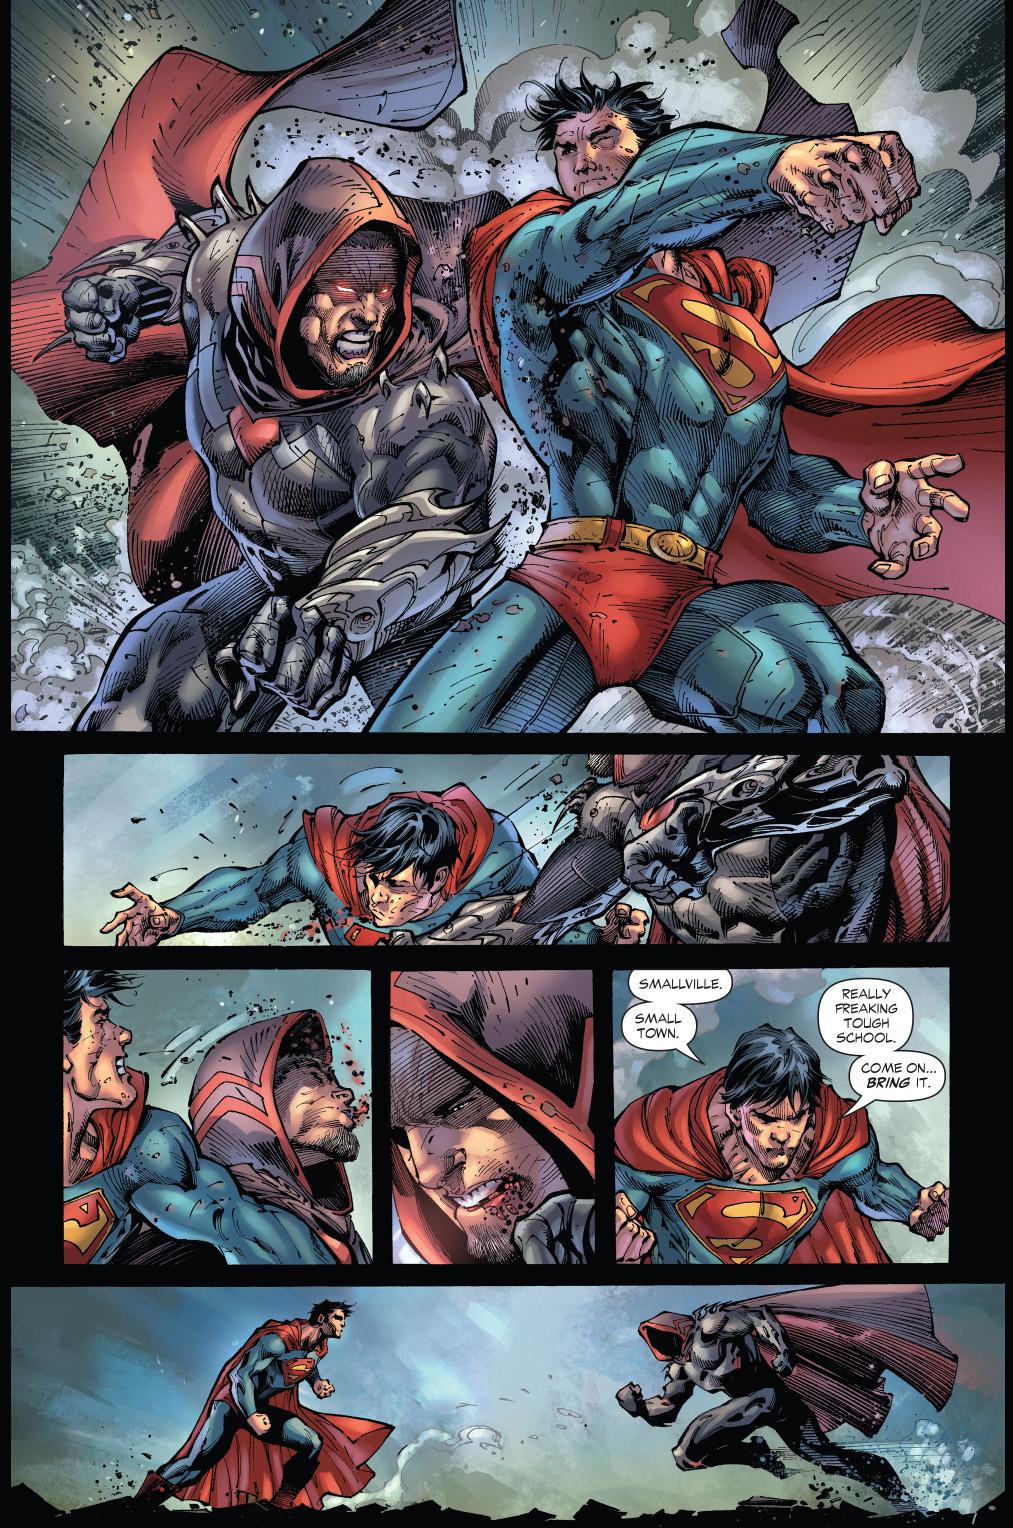 Smallville Comicnewbies